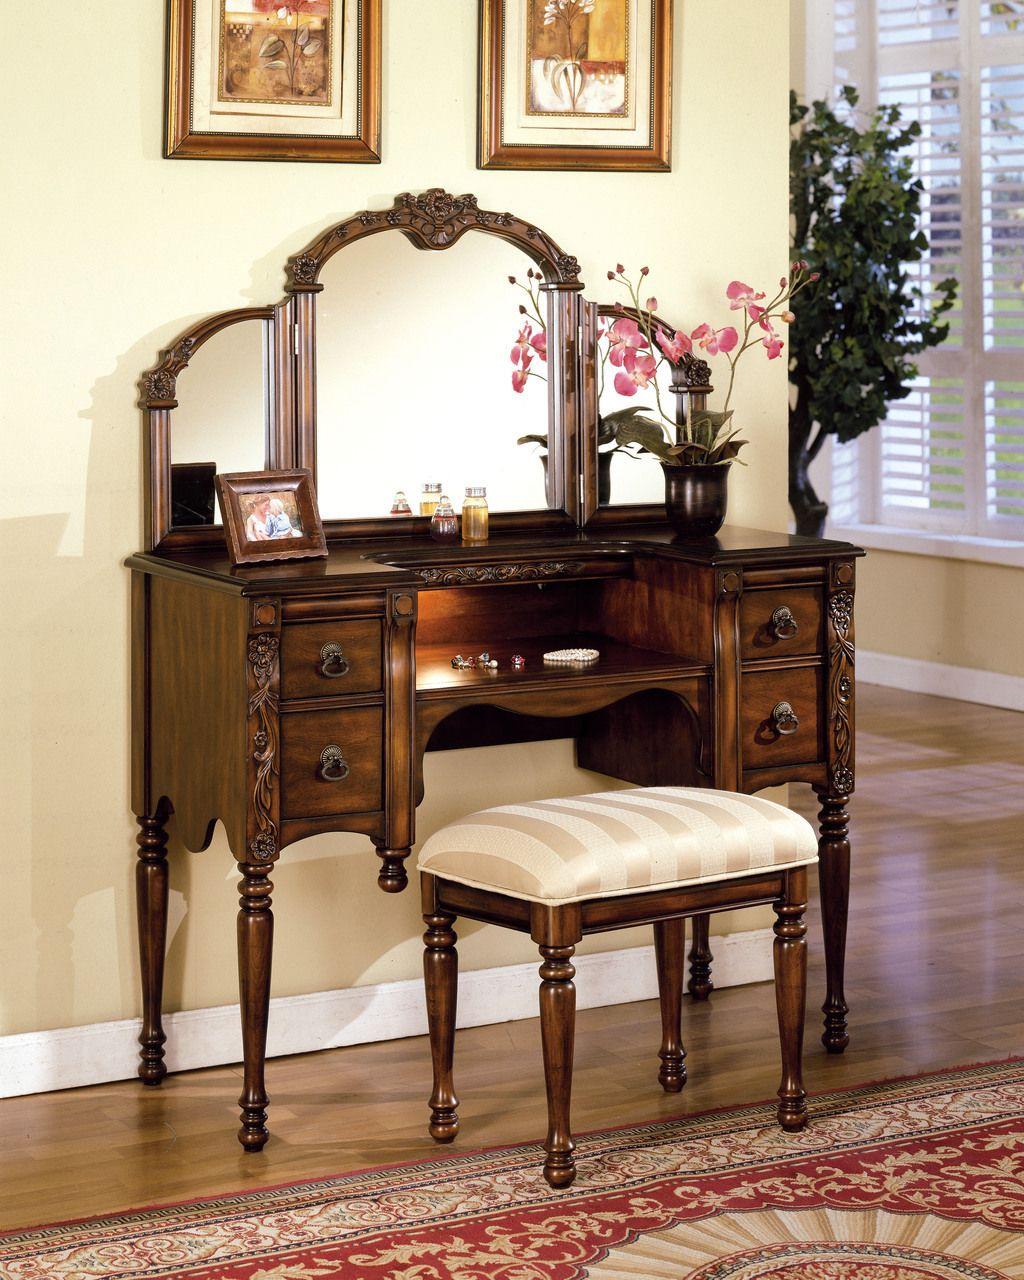 Sunnyvale antique oak vanity dressing table set dressing tables sunnyvale antique oak vanity dressing table set geotapseo Choice Image